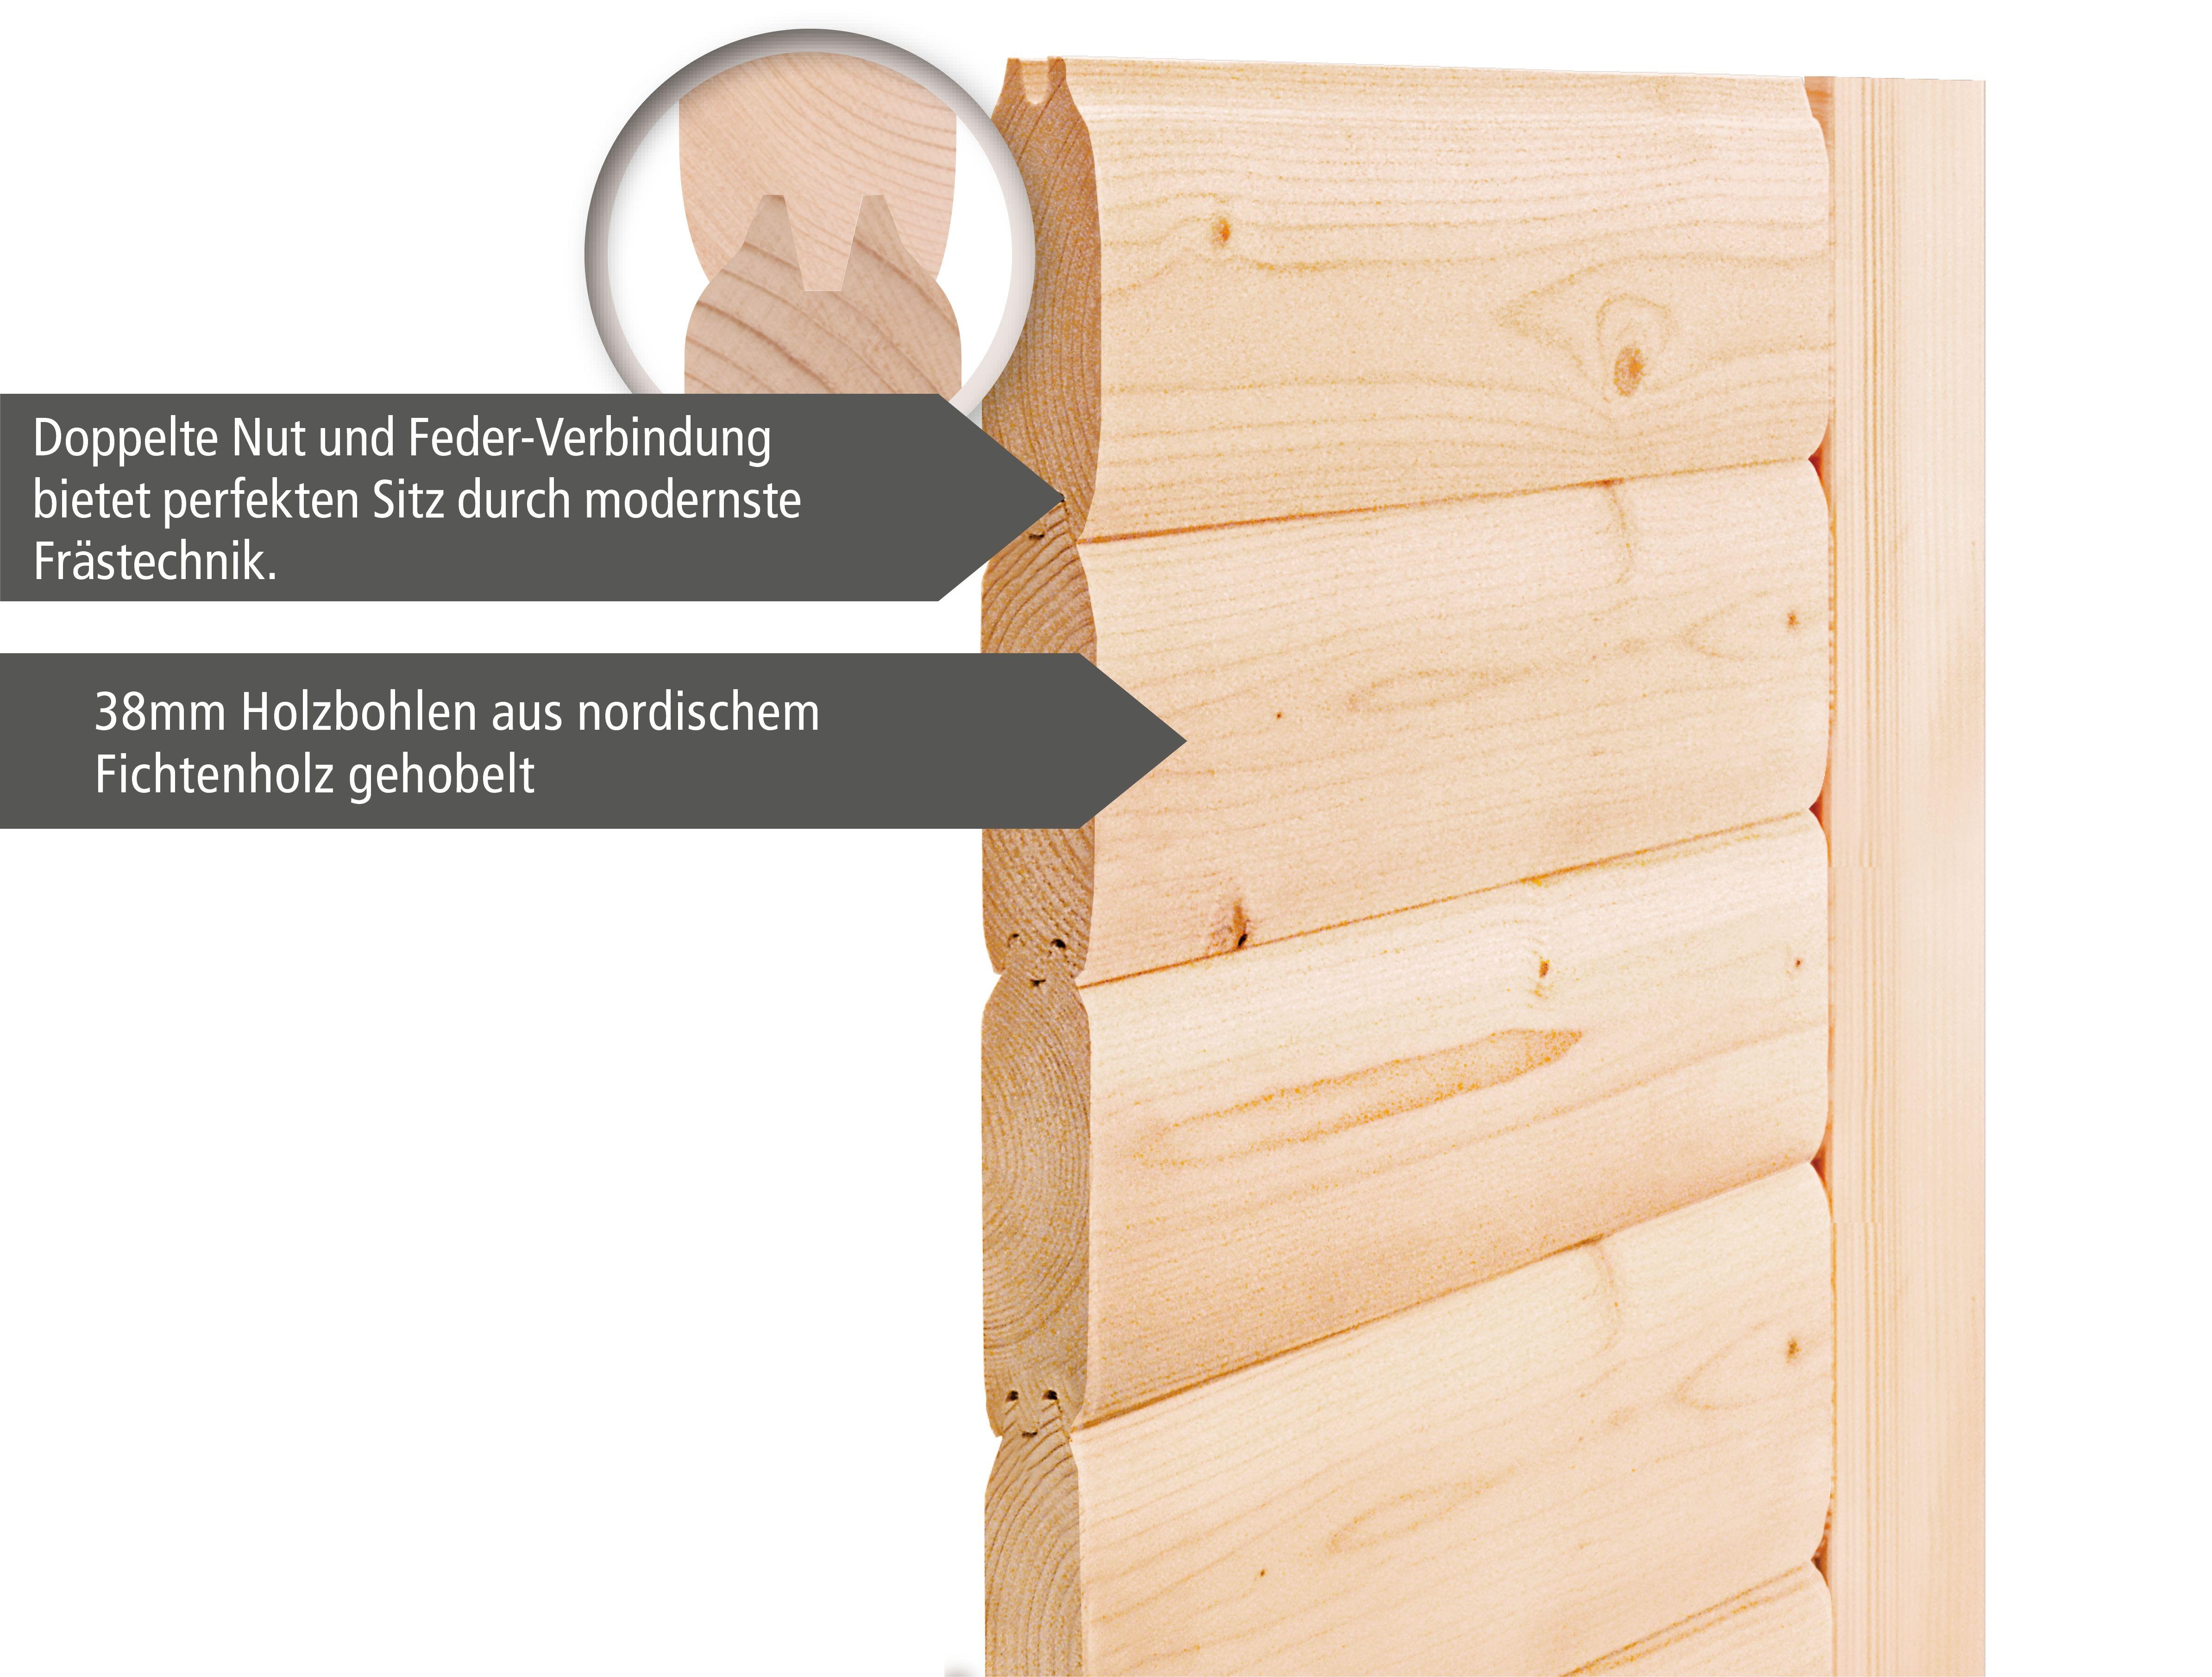 Woodfeeling Sauna Adelina 38mm Dachkranz Saunaofen 9kW intern Bild 6